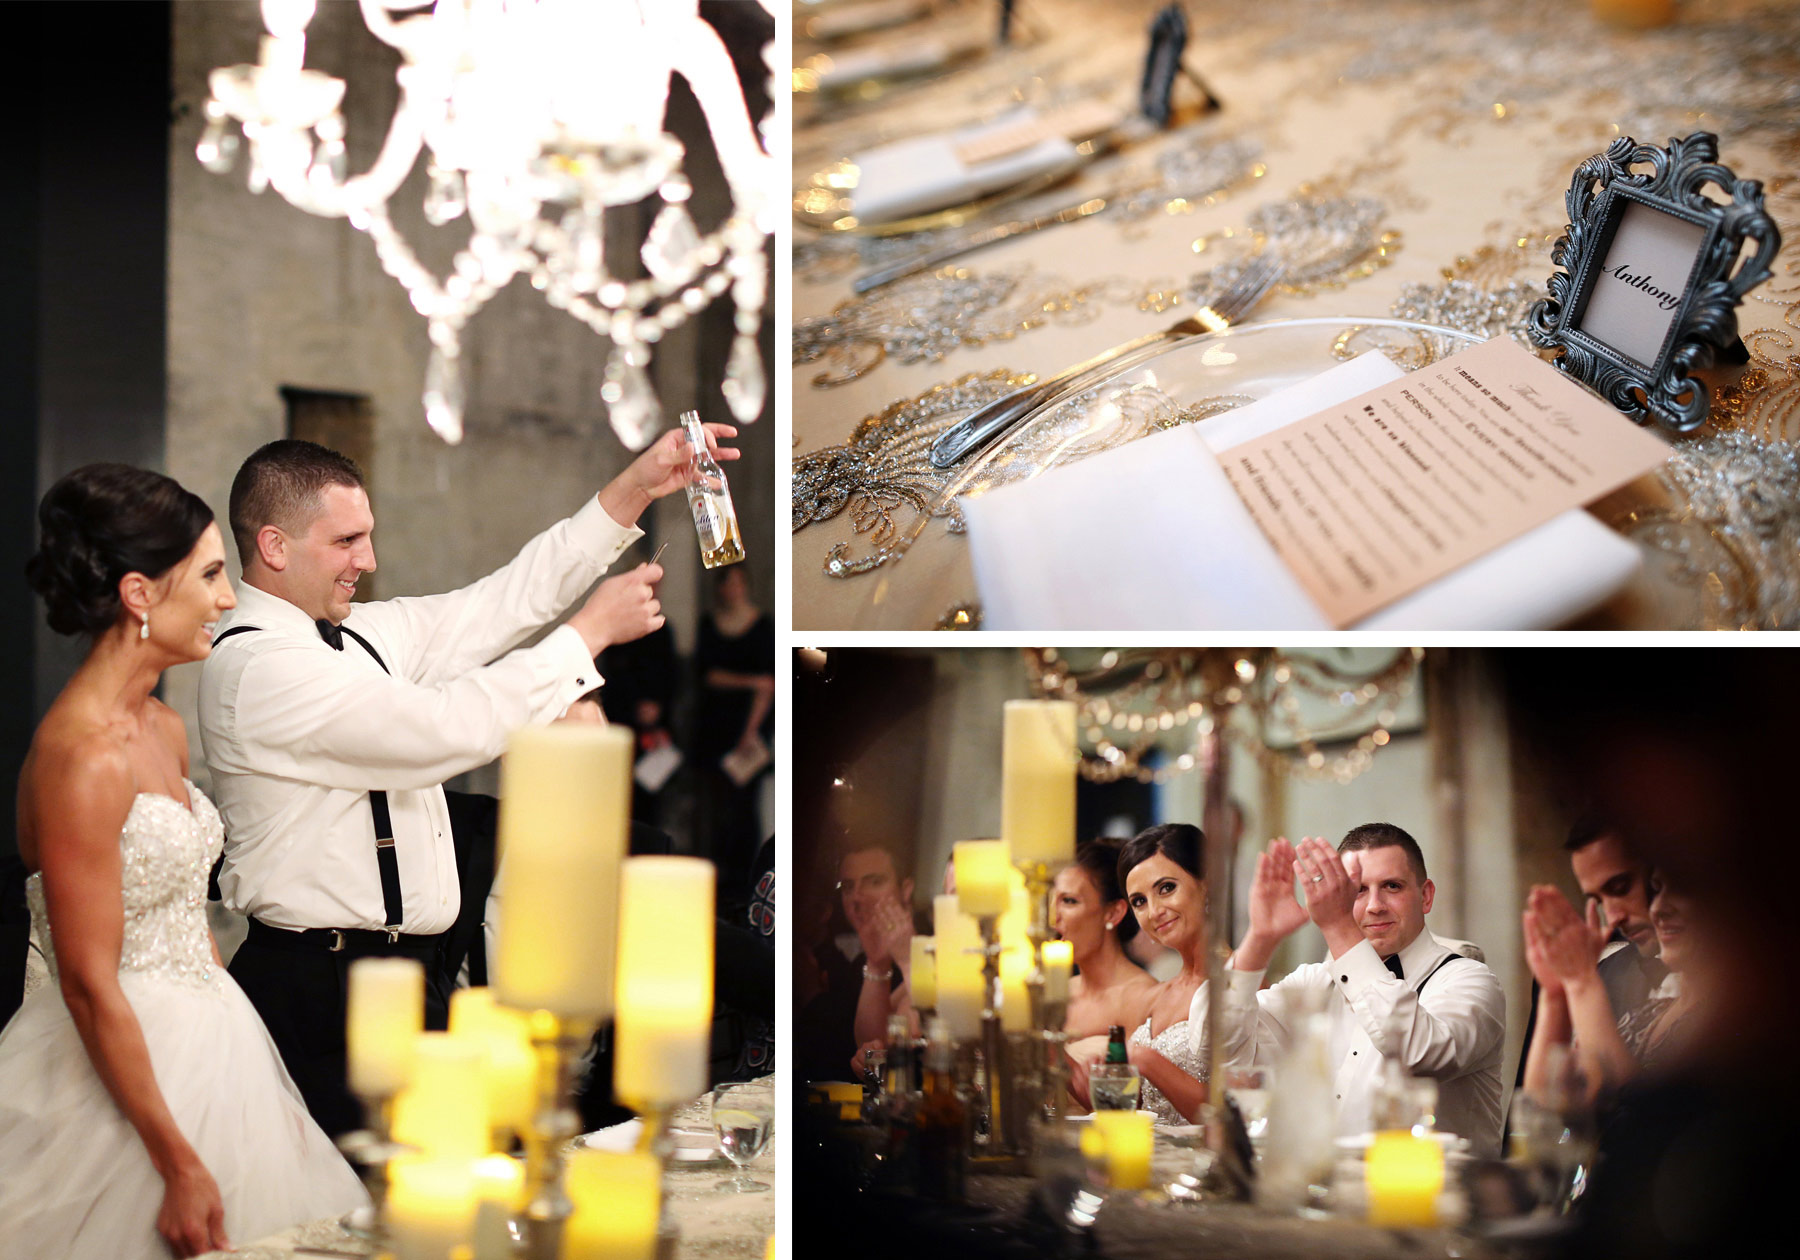 15-Minneapolis-Minnesota-Wedding-Photography-Aria-Downtown-Industrial-Reception-Decor-Melanie-and-Andrew.jpg